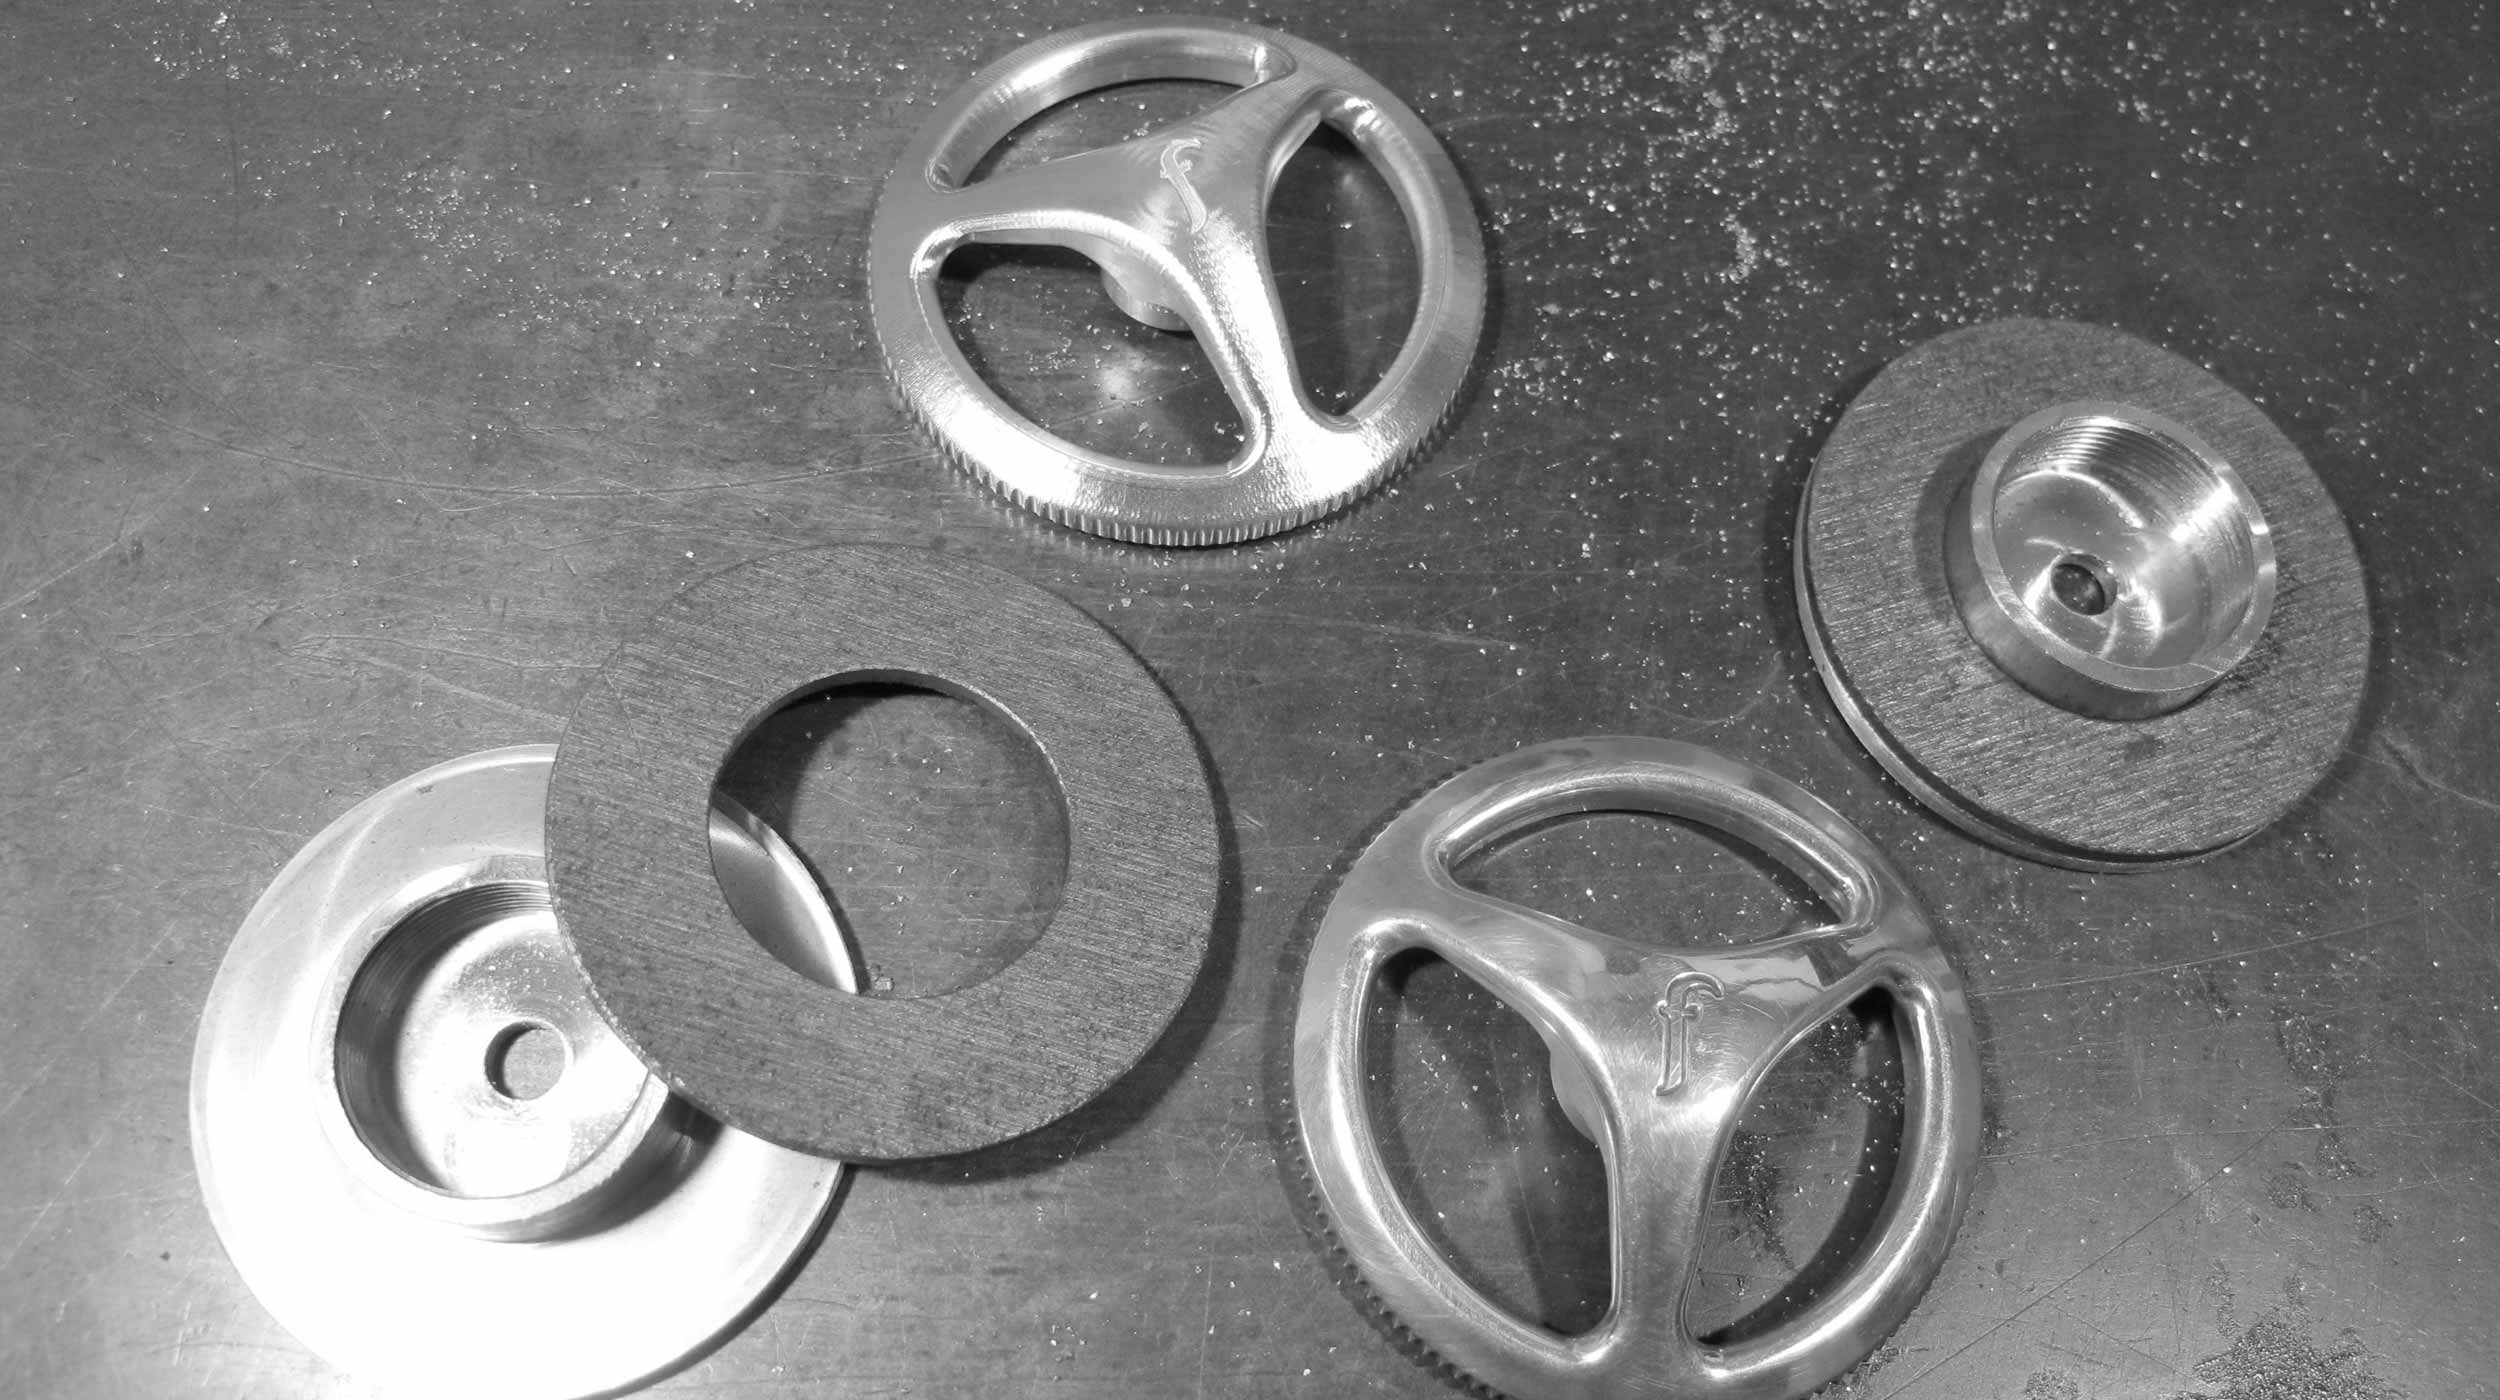 Kestrel-Fork-Friction-Dampener-Assembly.jpg